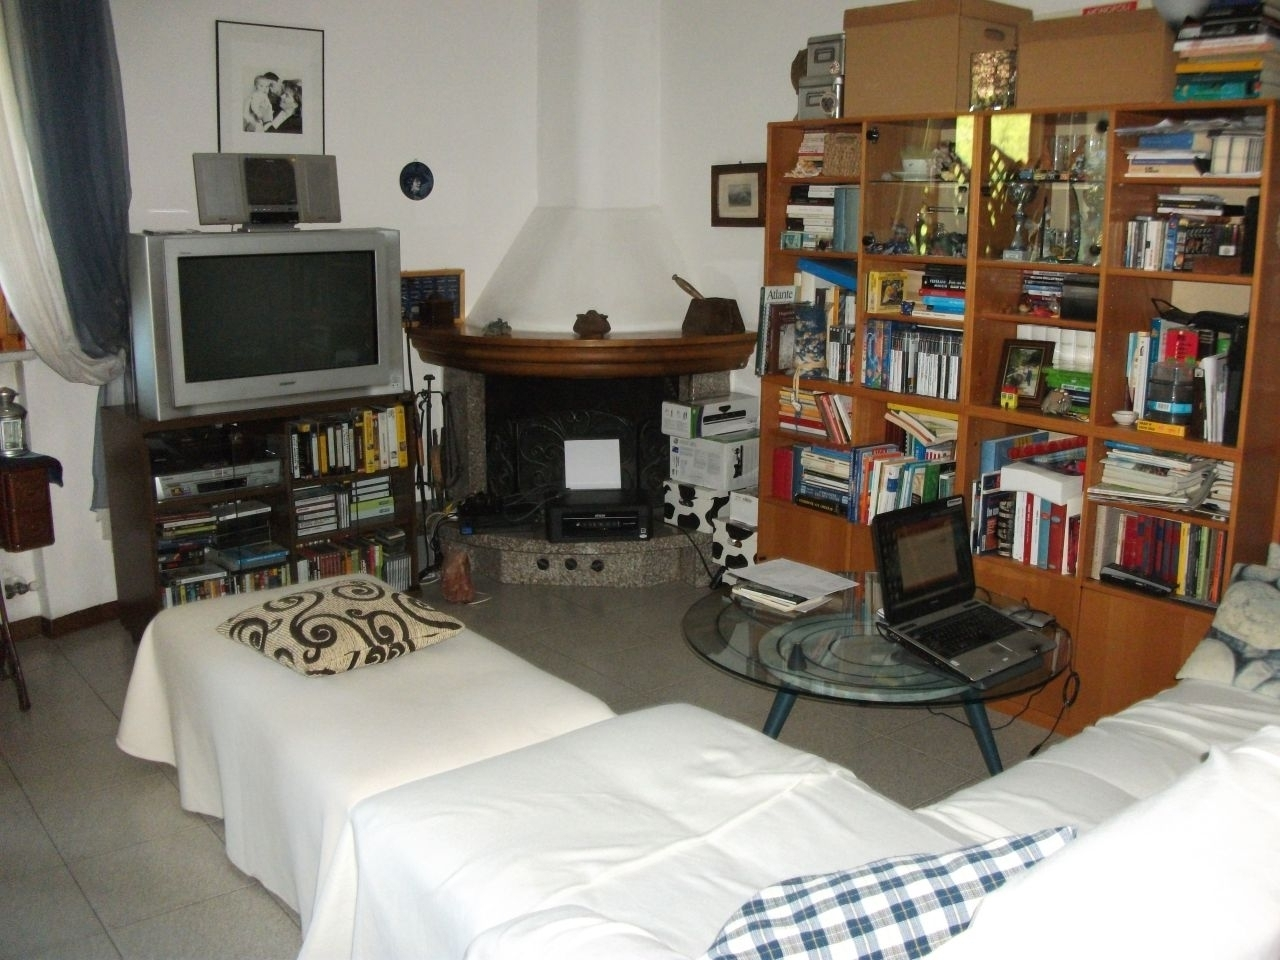 Appartamento 5 locali in vendita a Carrara (MS)